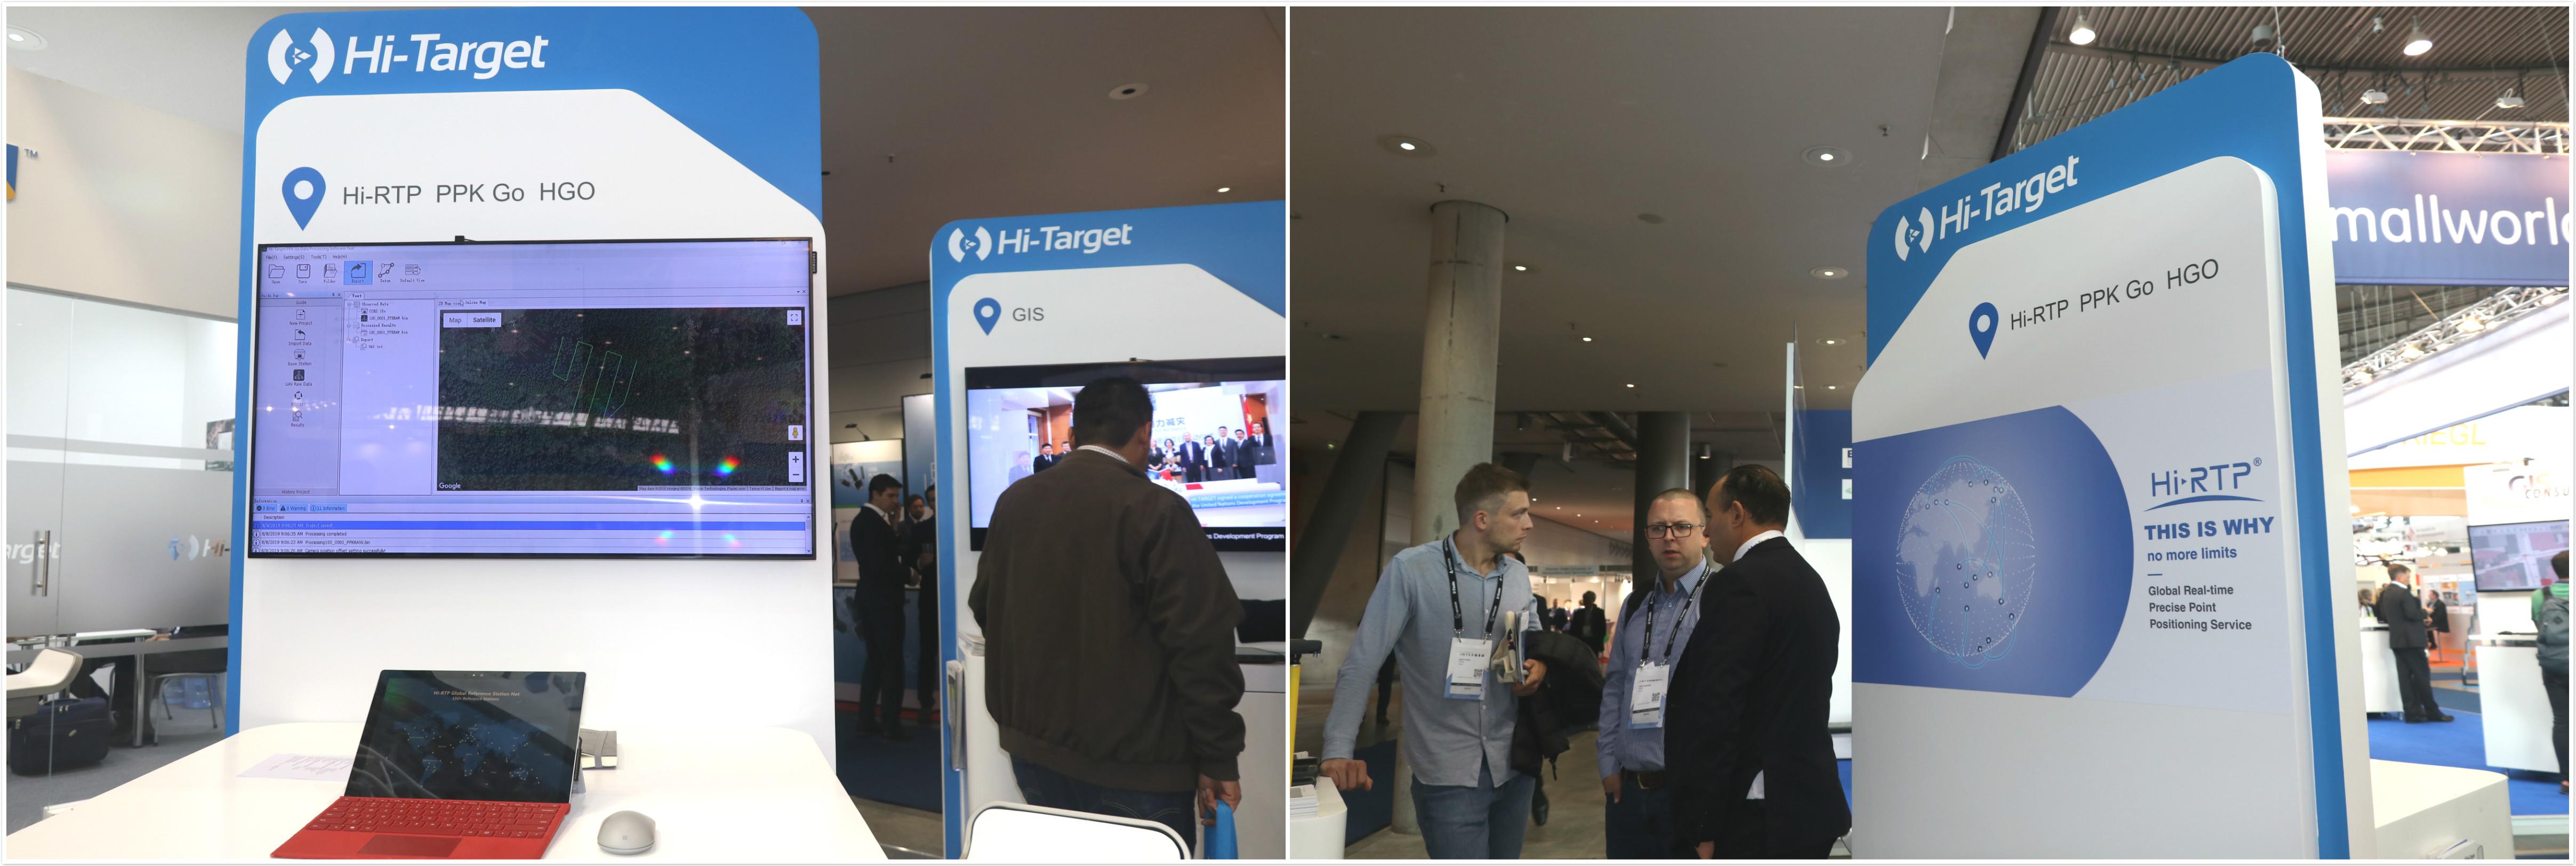 20191010025136564 - Hi-Target Participated at INTERGEO 2019 in Stuttgart, Germany